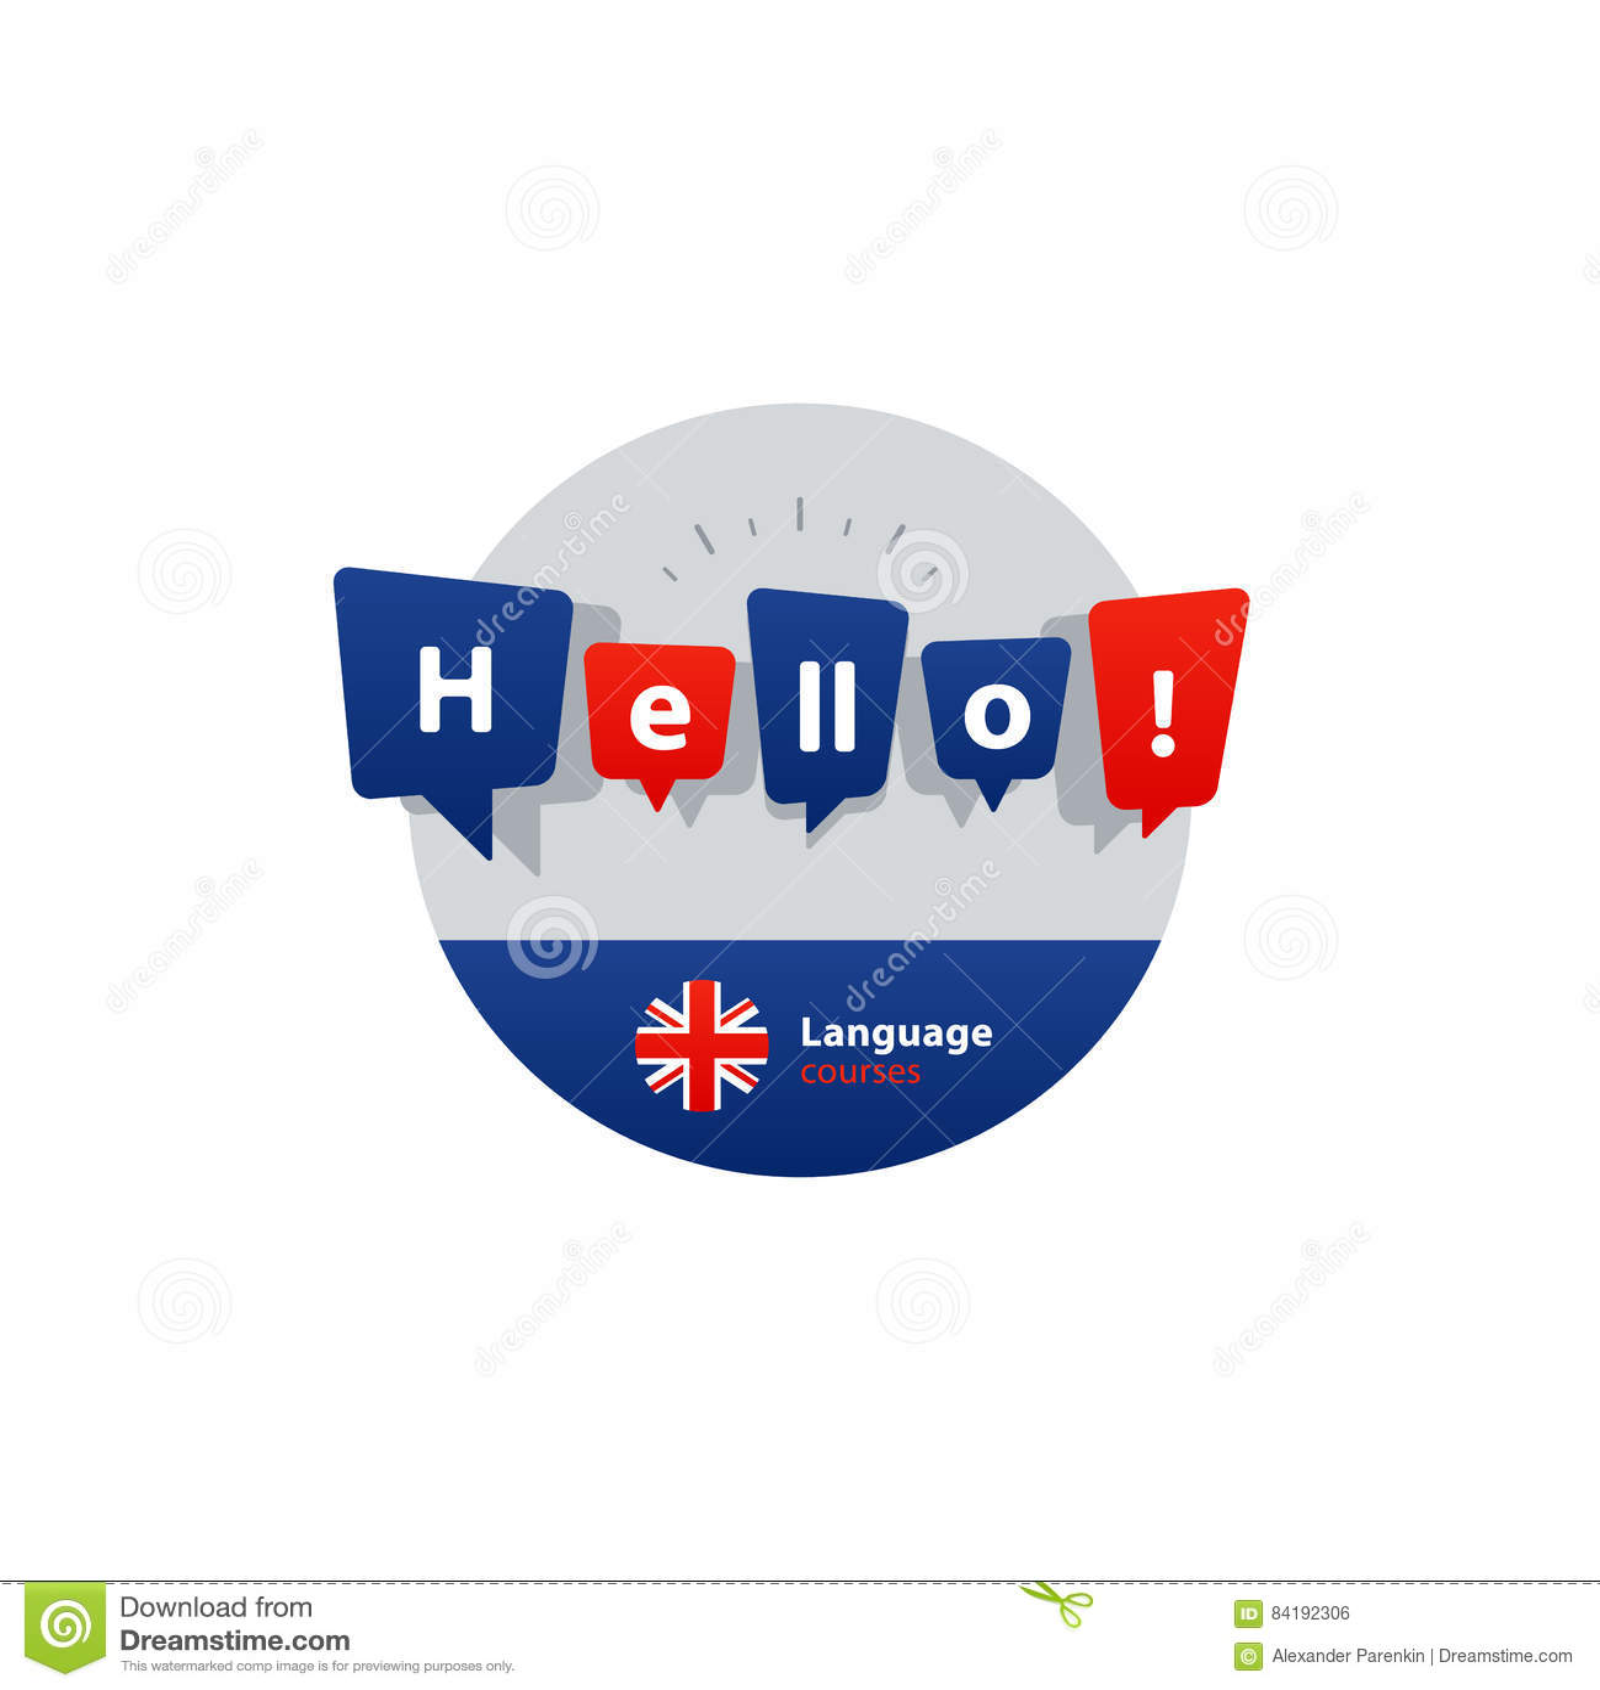 English language courses advertising concept. Fluent speaking foreign language